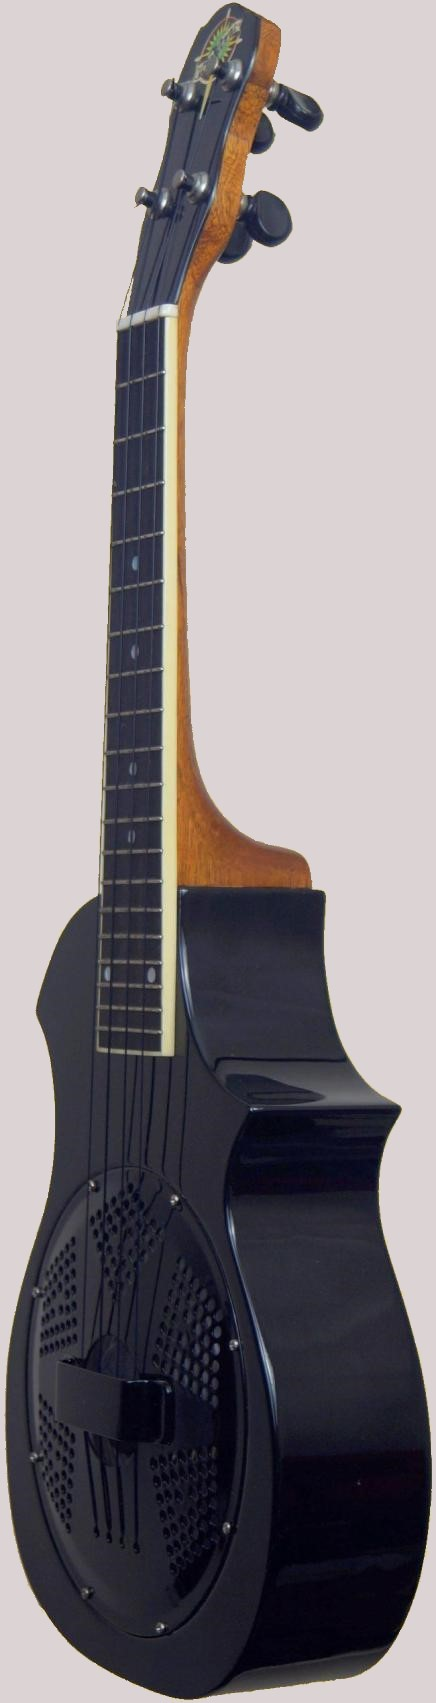 beltona cutaway dobro Ukulele